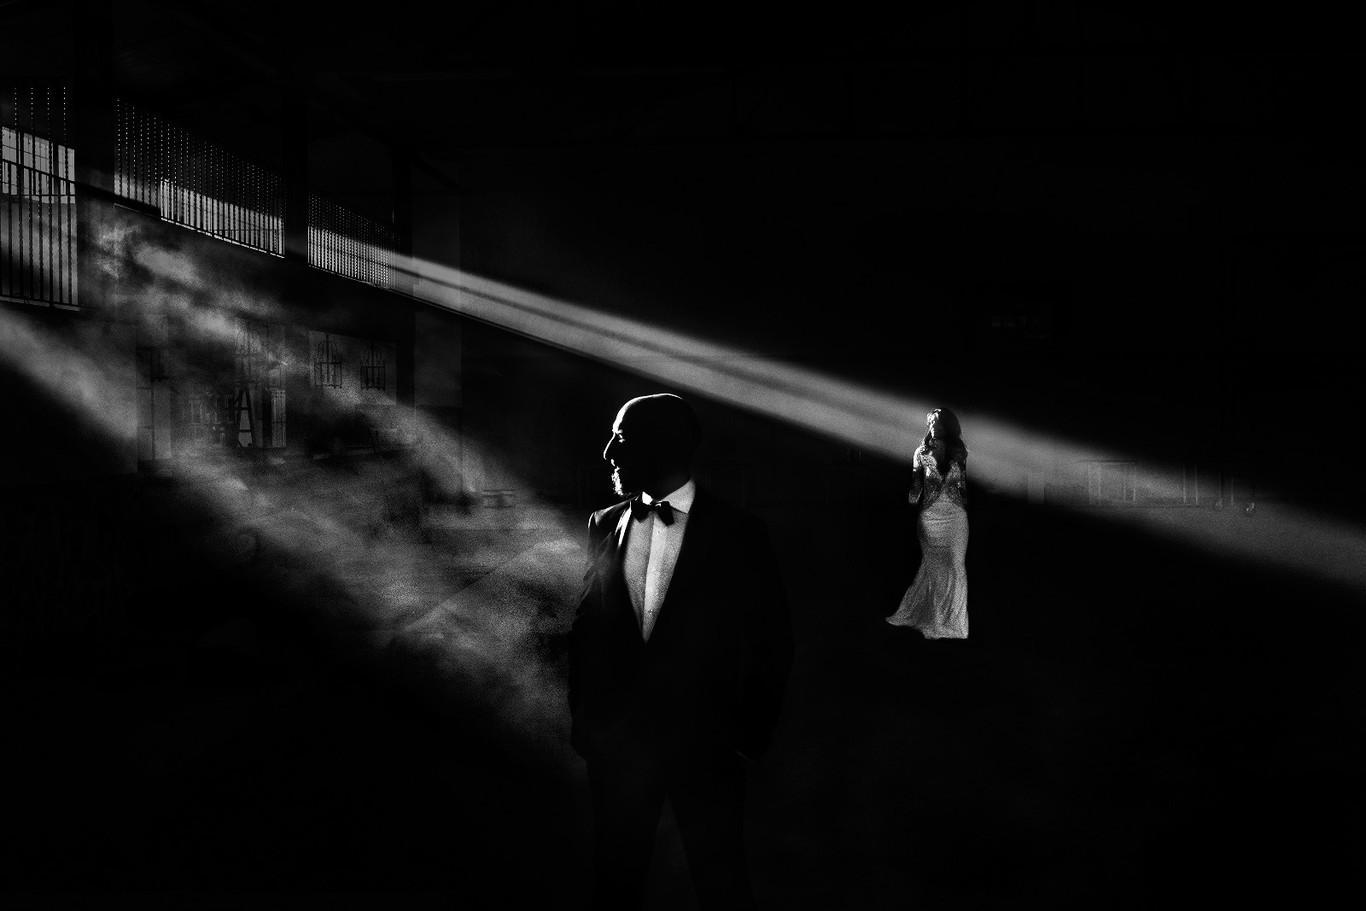 "Víctor Lax vuelve a coronarse como ""Mejor fotógrafo de bodas del mundo"" en 2018 según el portal Fearless Photographer"